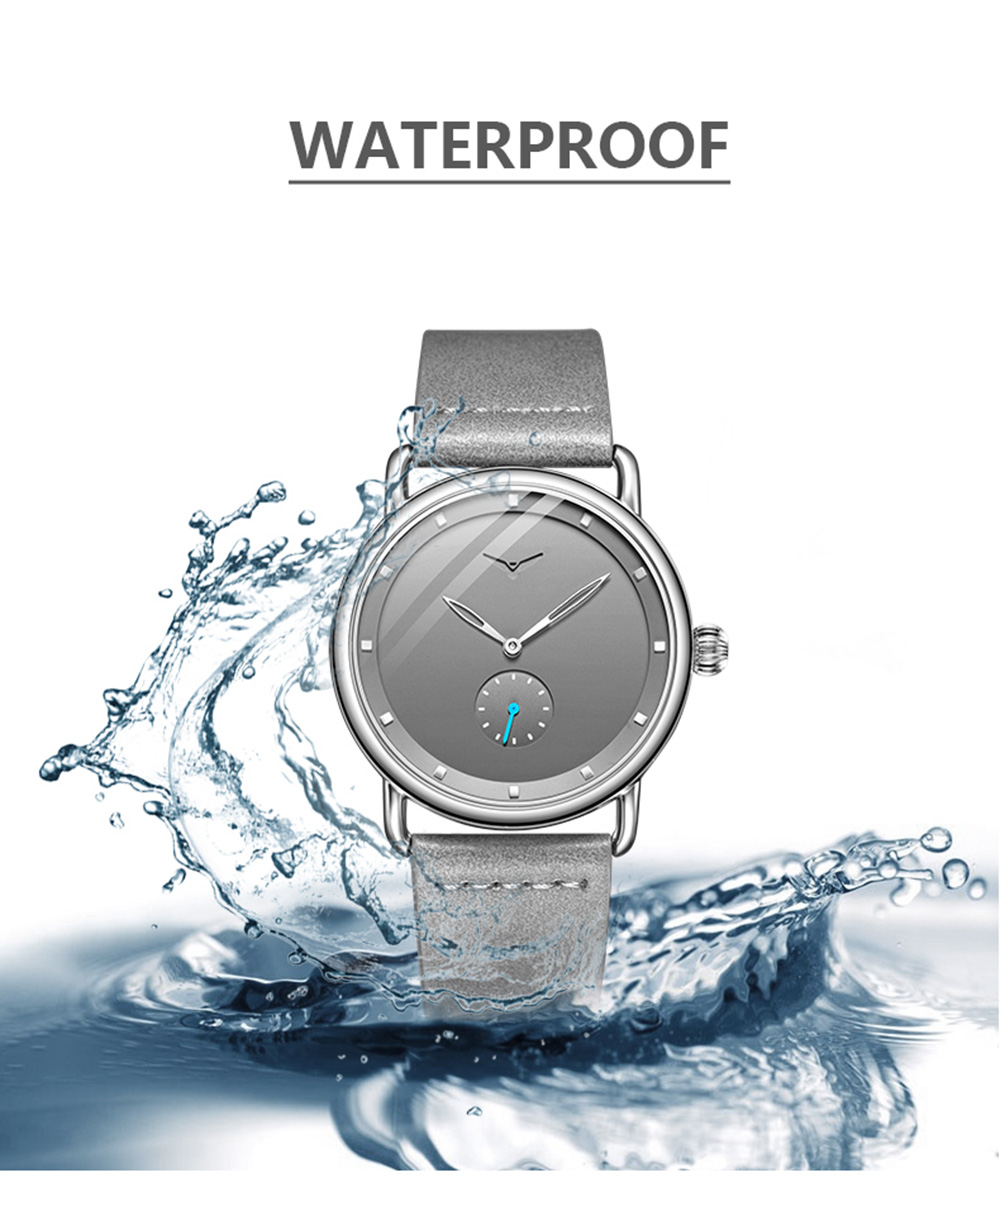 H3b95309c2902460d95dc0e9a1f80bef28 ONOLA top brand leather men watches clock fashion sport simple casual waterproof Wrist watch men relogio masculino